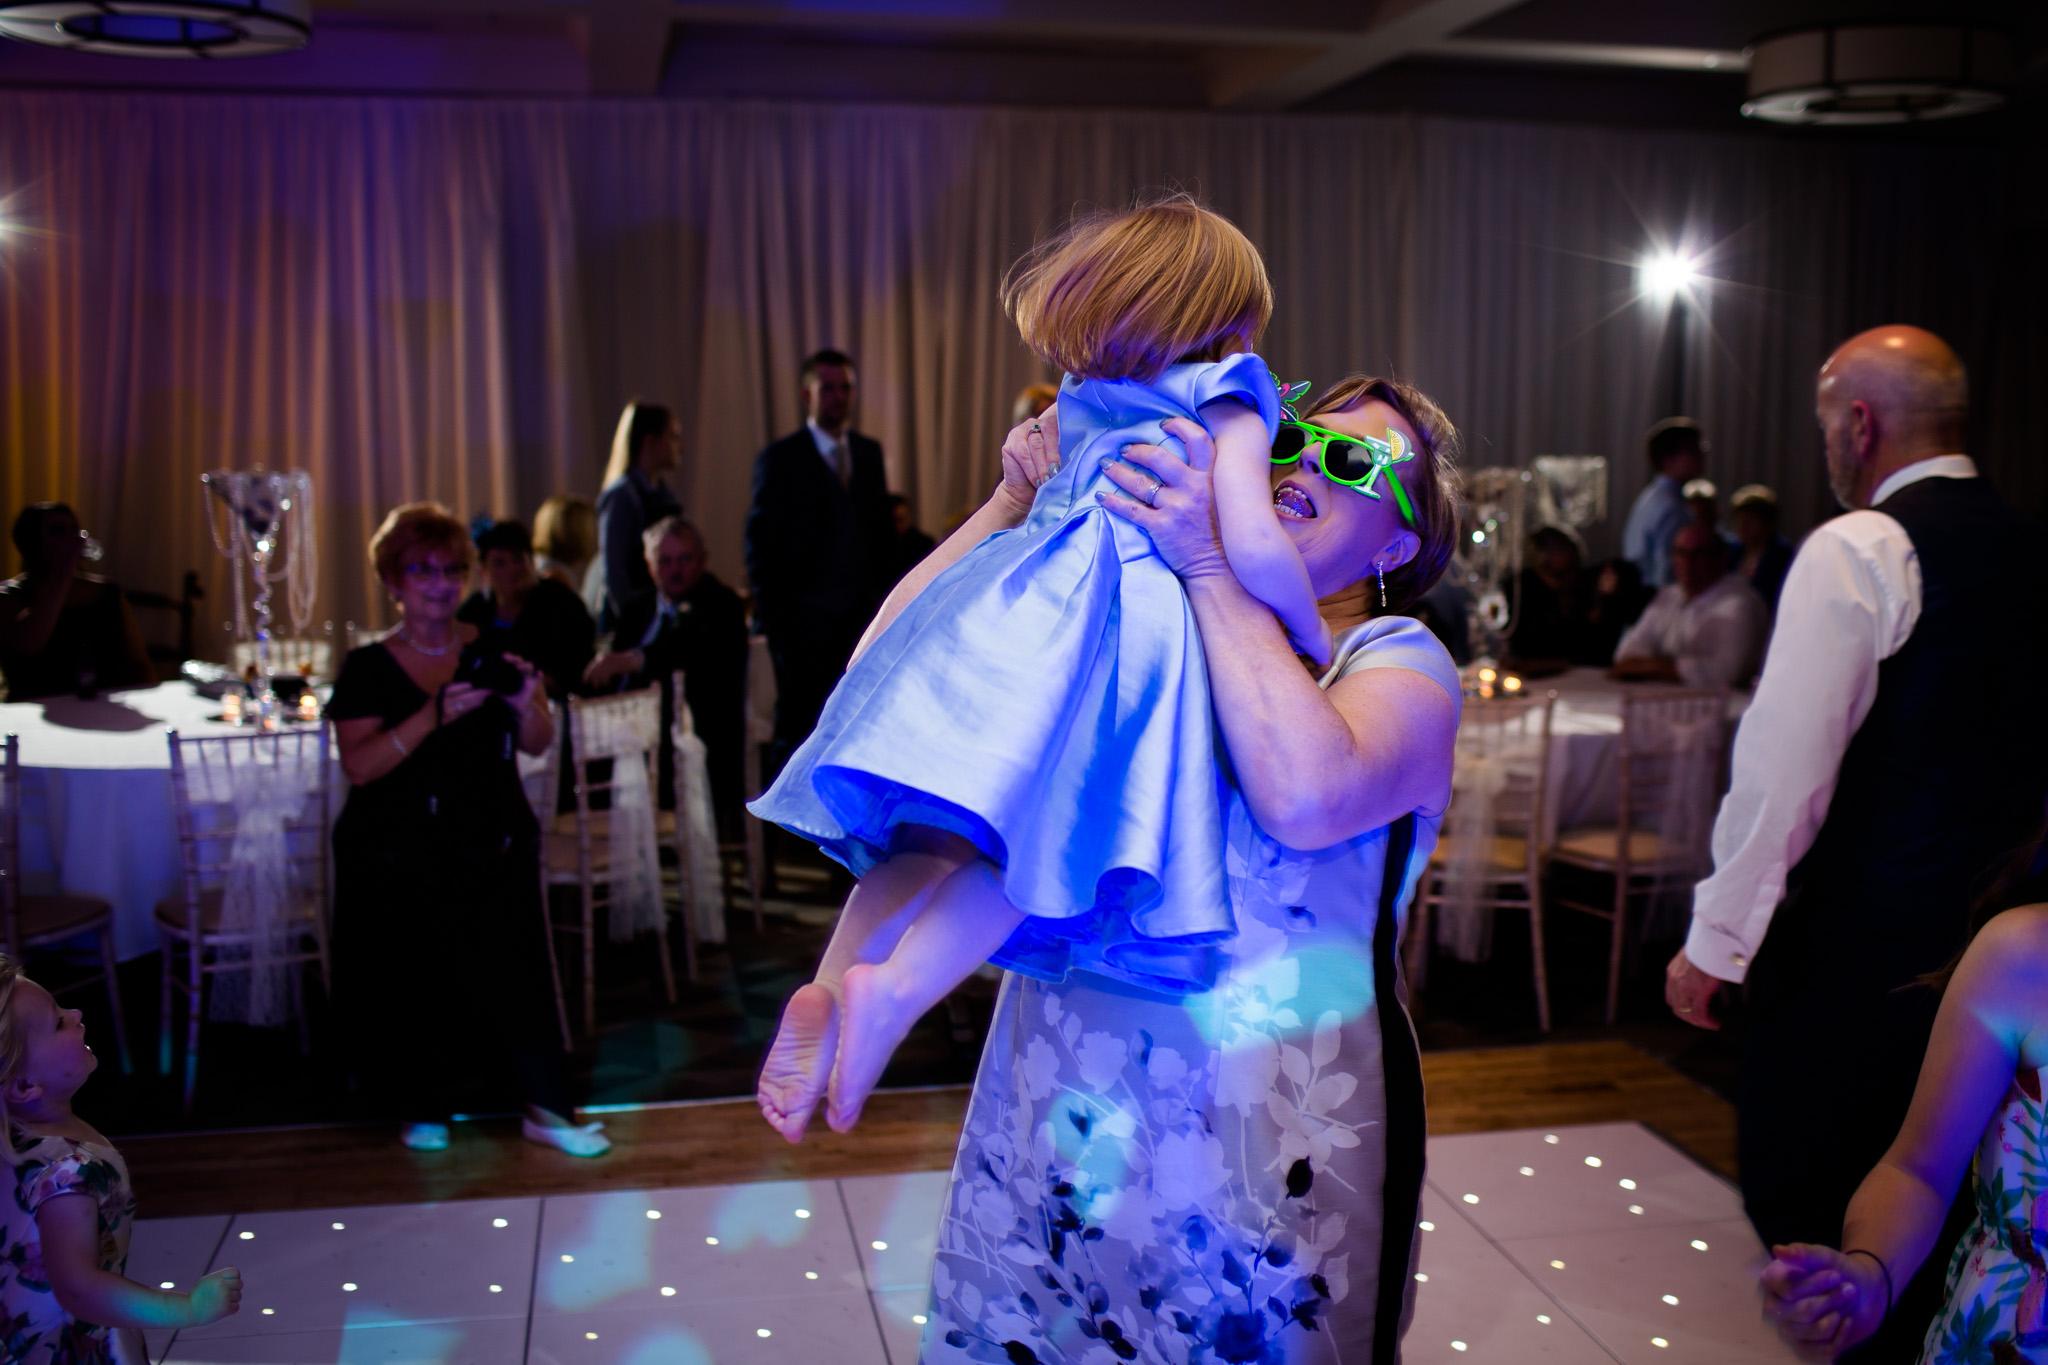 Mark_Barnes_Northern_Ireland_Wedding_Photography_Marine_hotel_ballycastle_Wedding_Photography_Janet&Darren-39.jpg